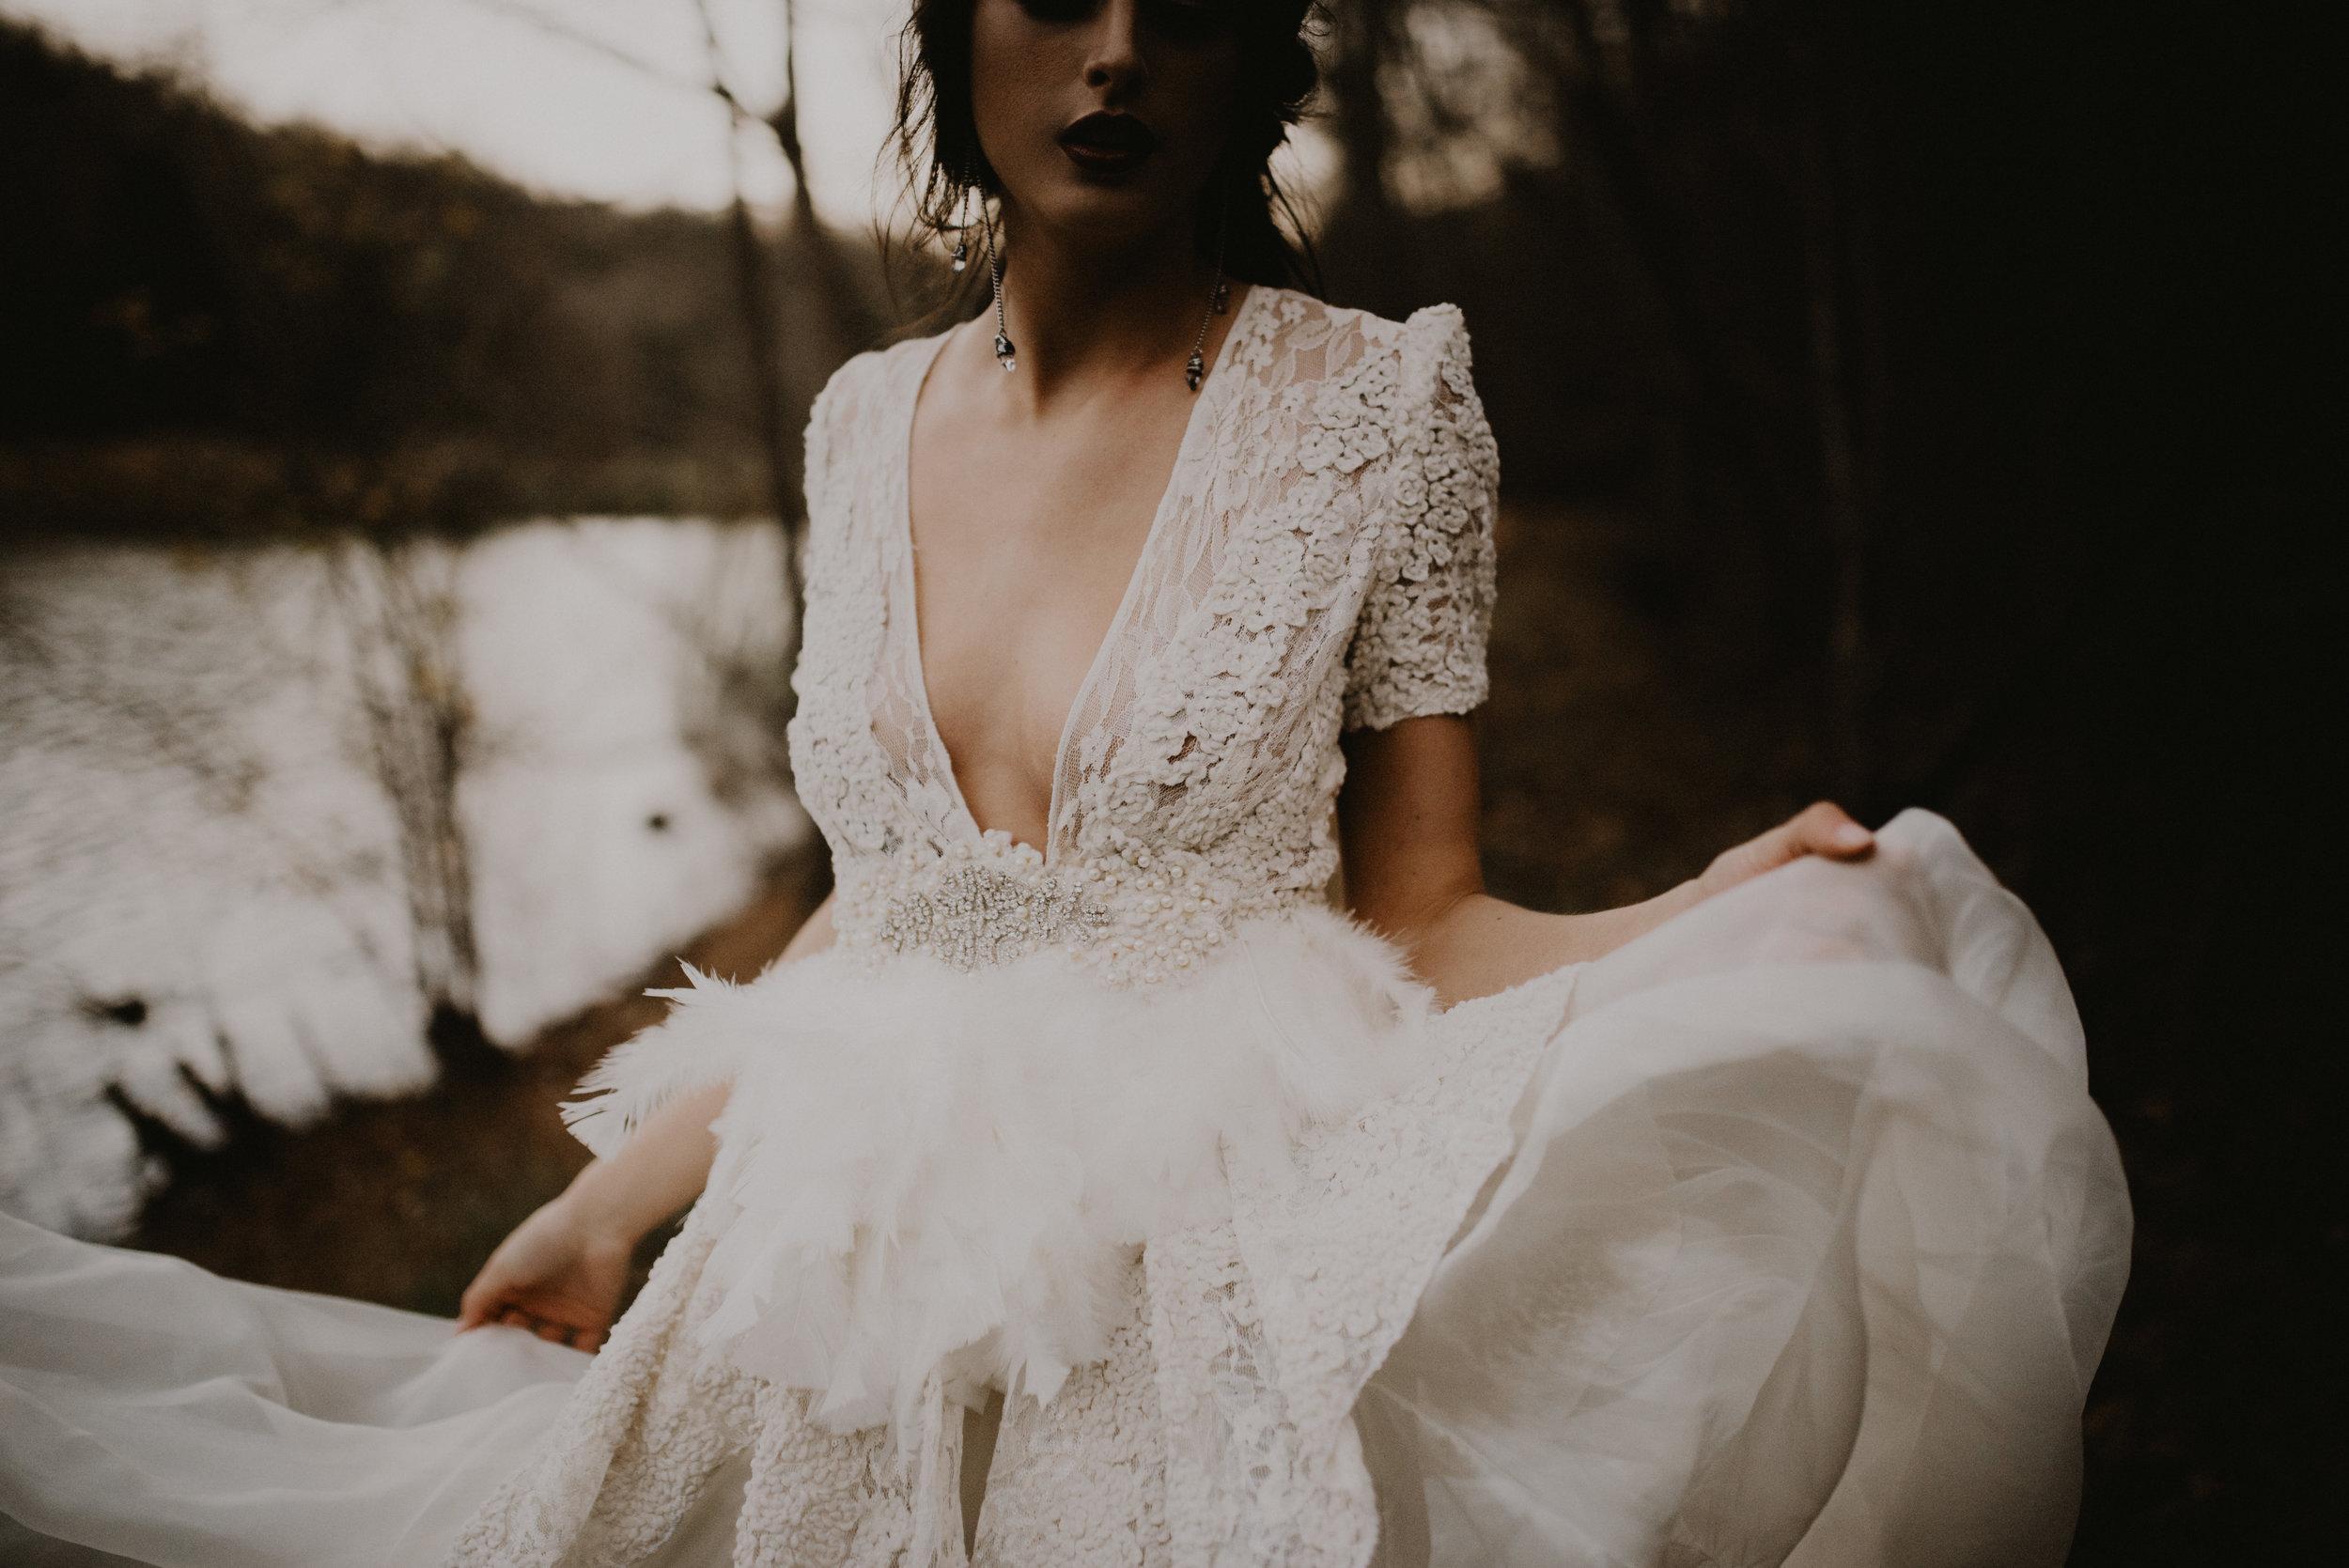 Aphrodite + Adonis: Styled Series